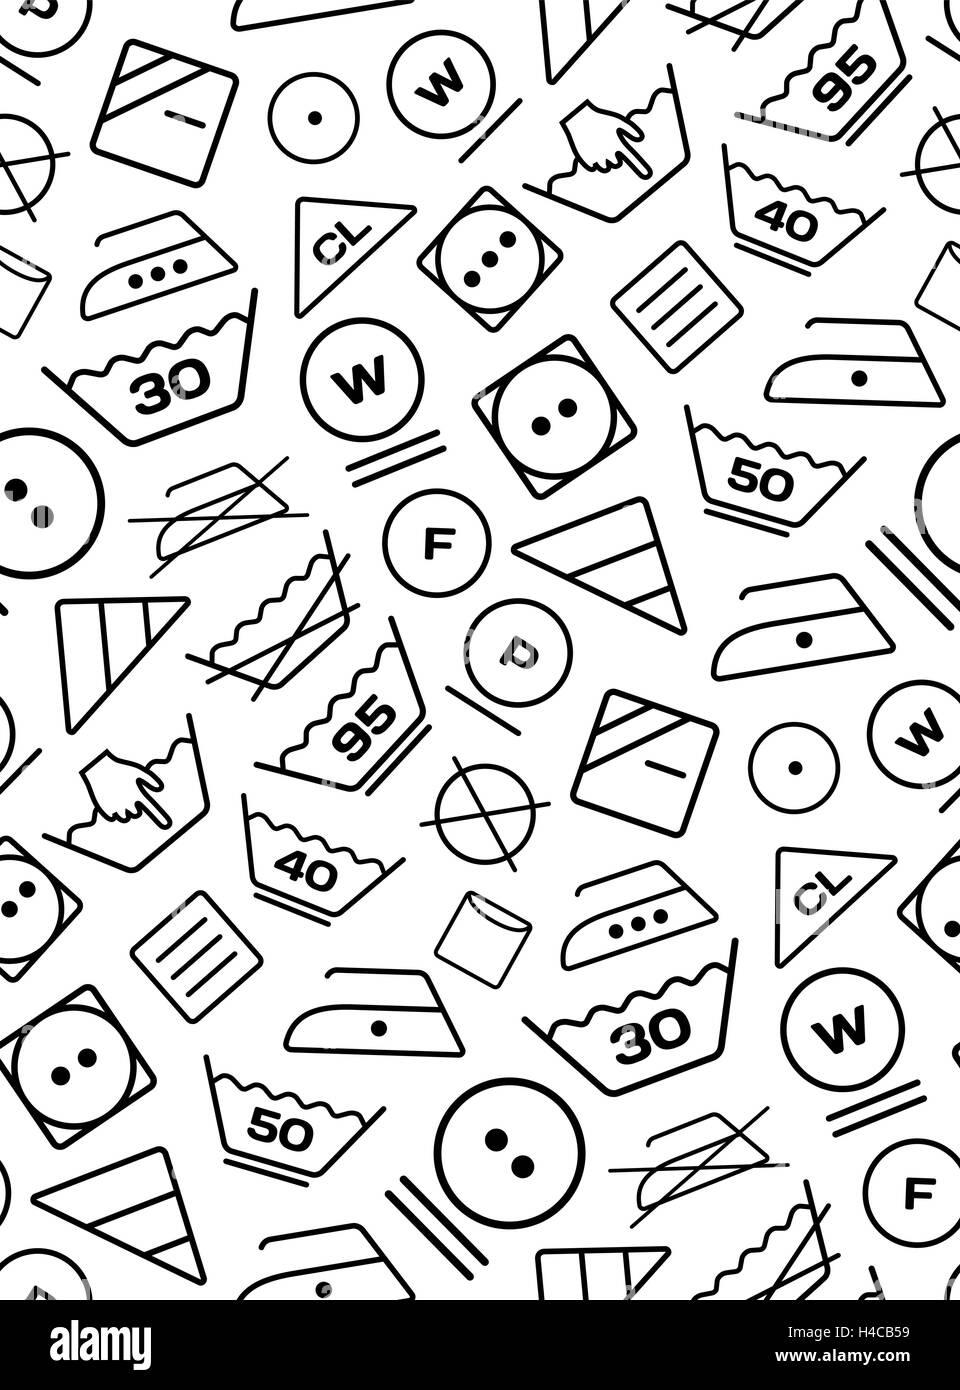 Pattern created from laundry washing symbols on a white background pattern created from laundry washing symbols on a white background biocorpaavc